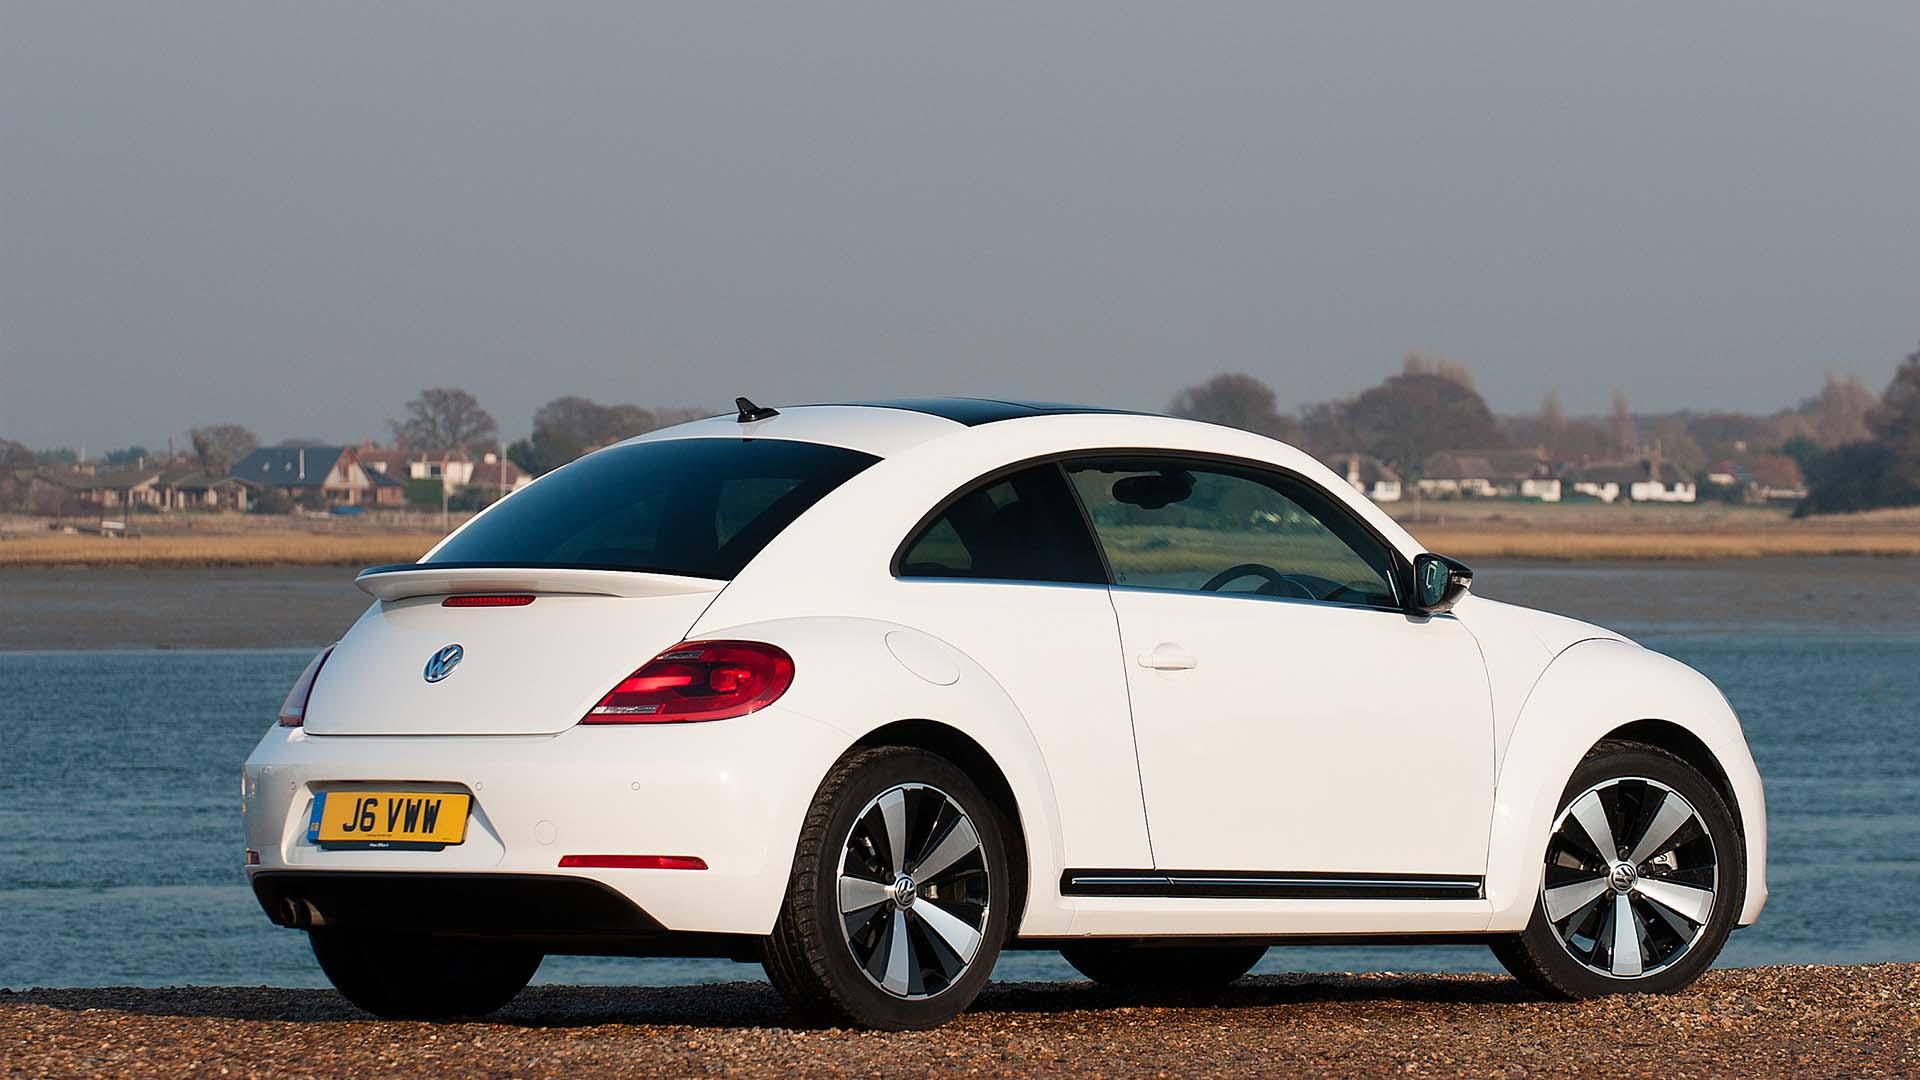 VW Beetle Production at a Dead End